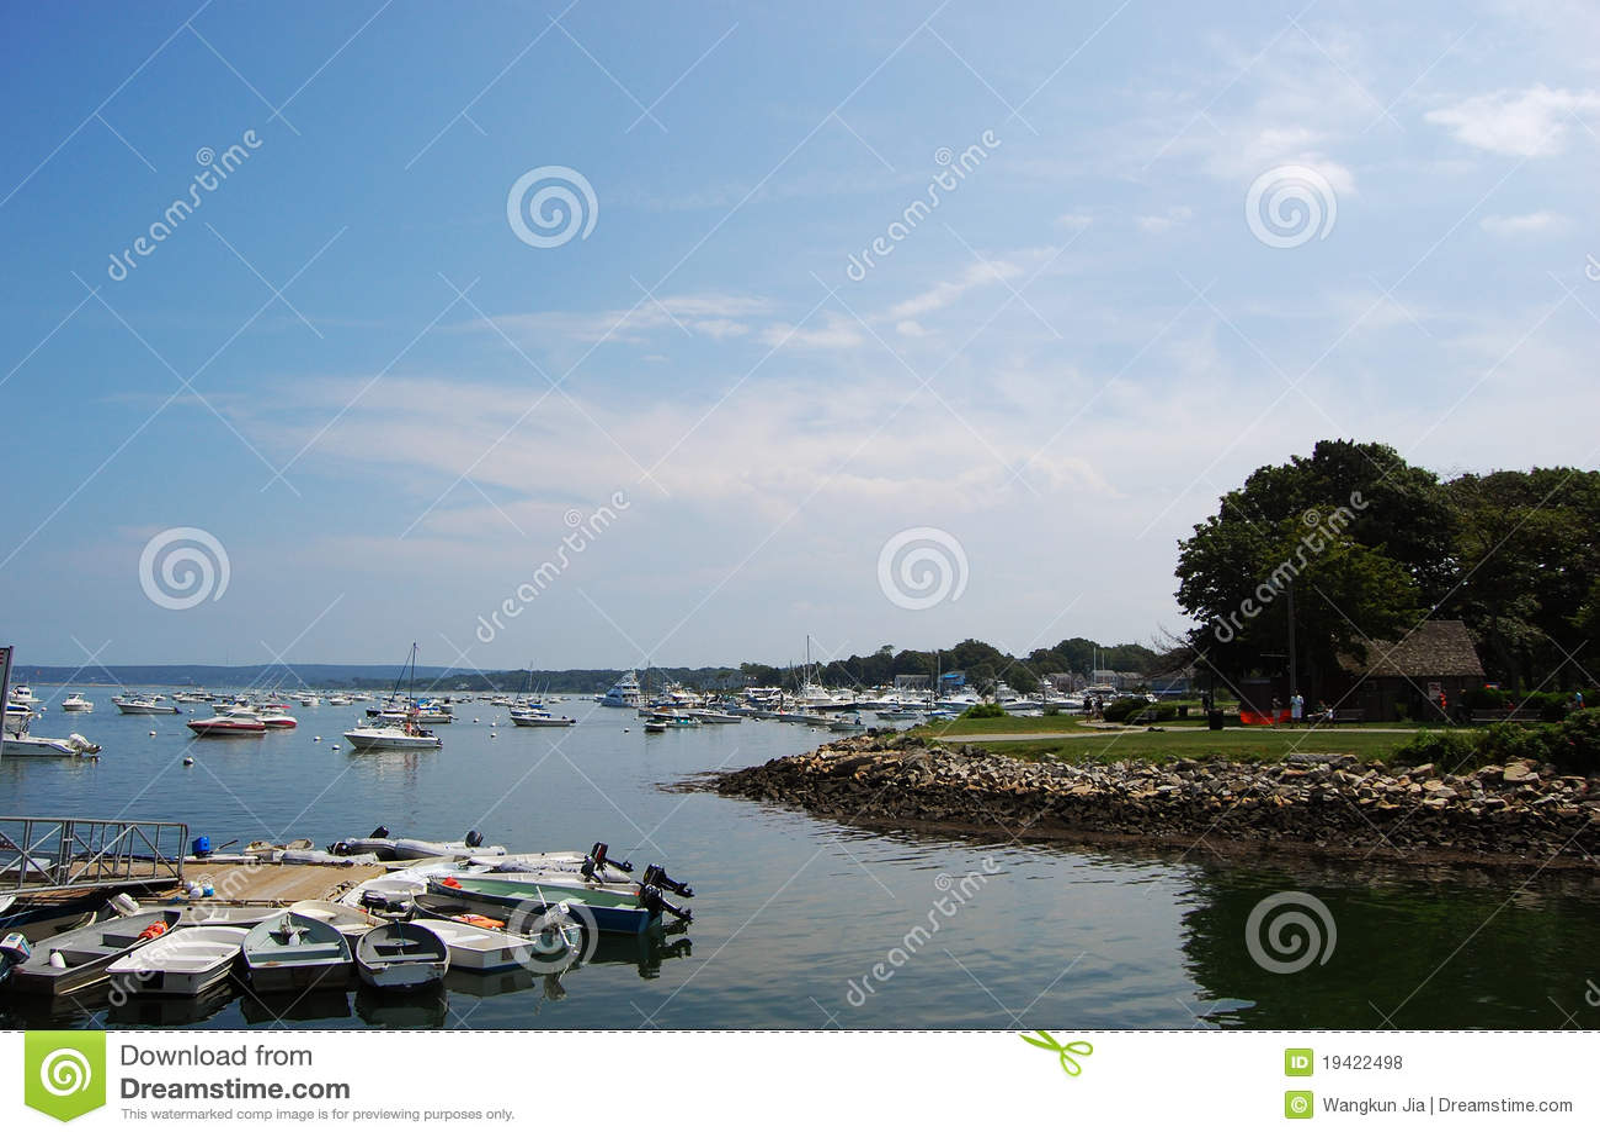 Costa de mar rochosa em Plymouth, Massachusetts